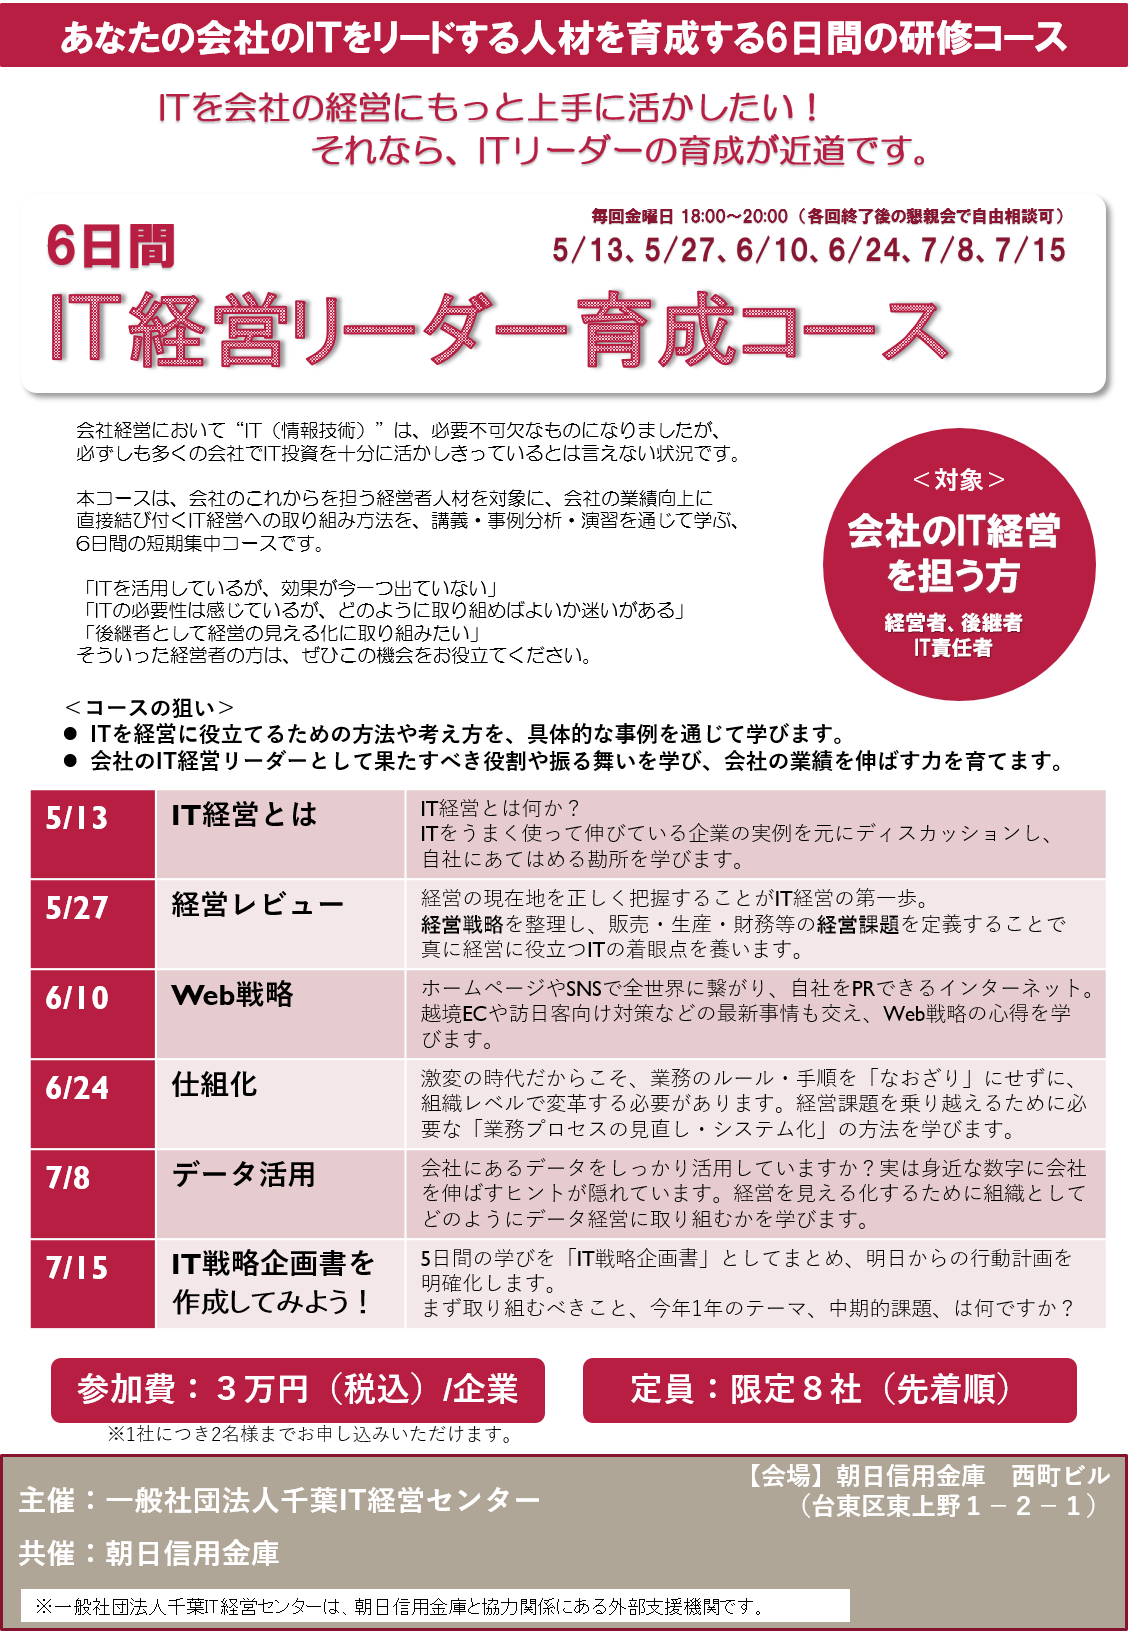 20160407_IT経営リーダー育成研修チラシV4